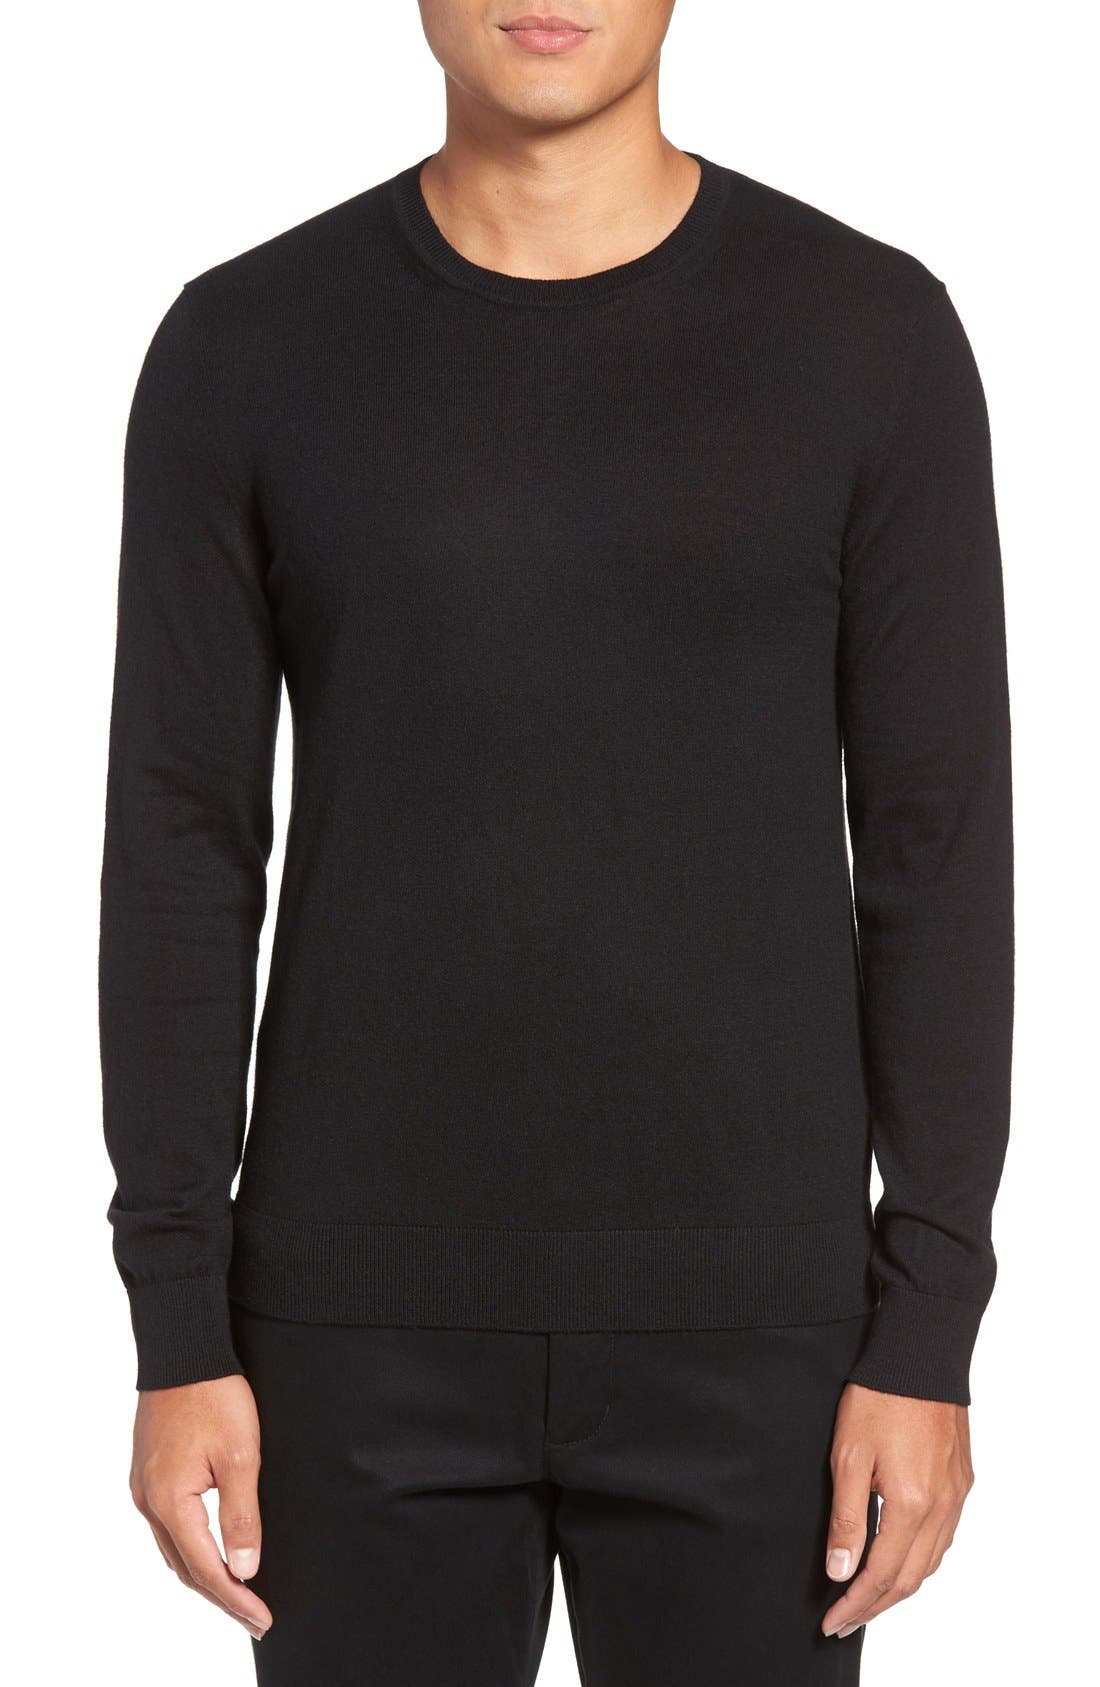 Burberry Brit Richmond Cotton & Cashmere Sweater